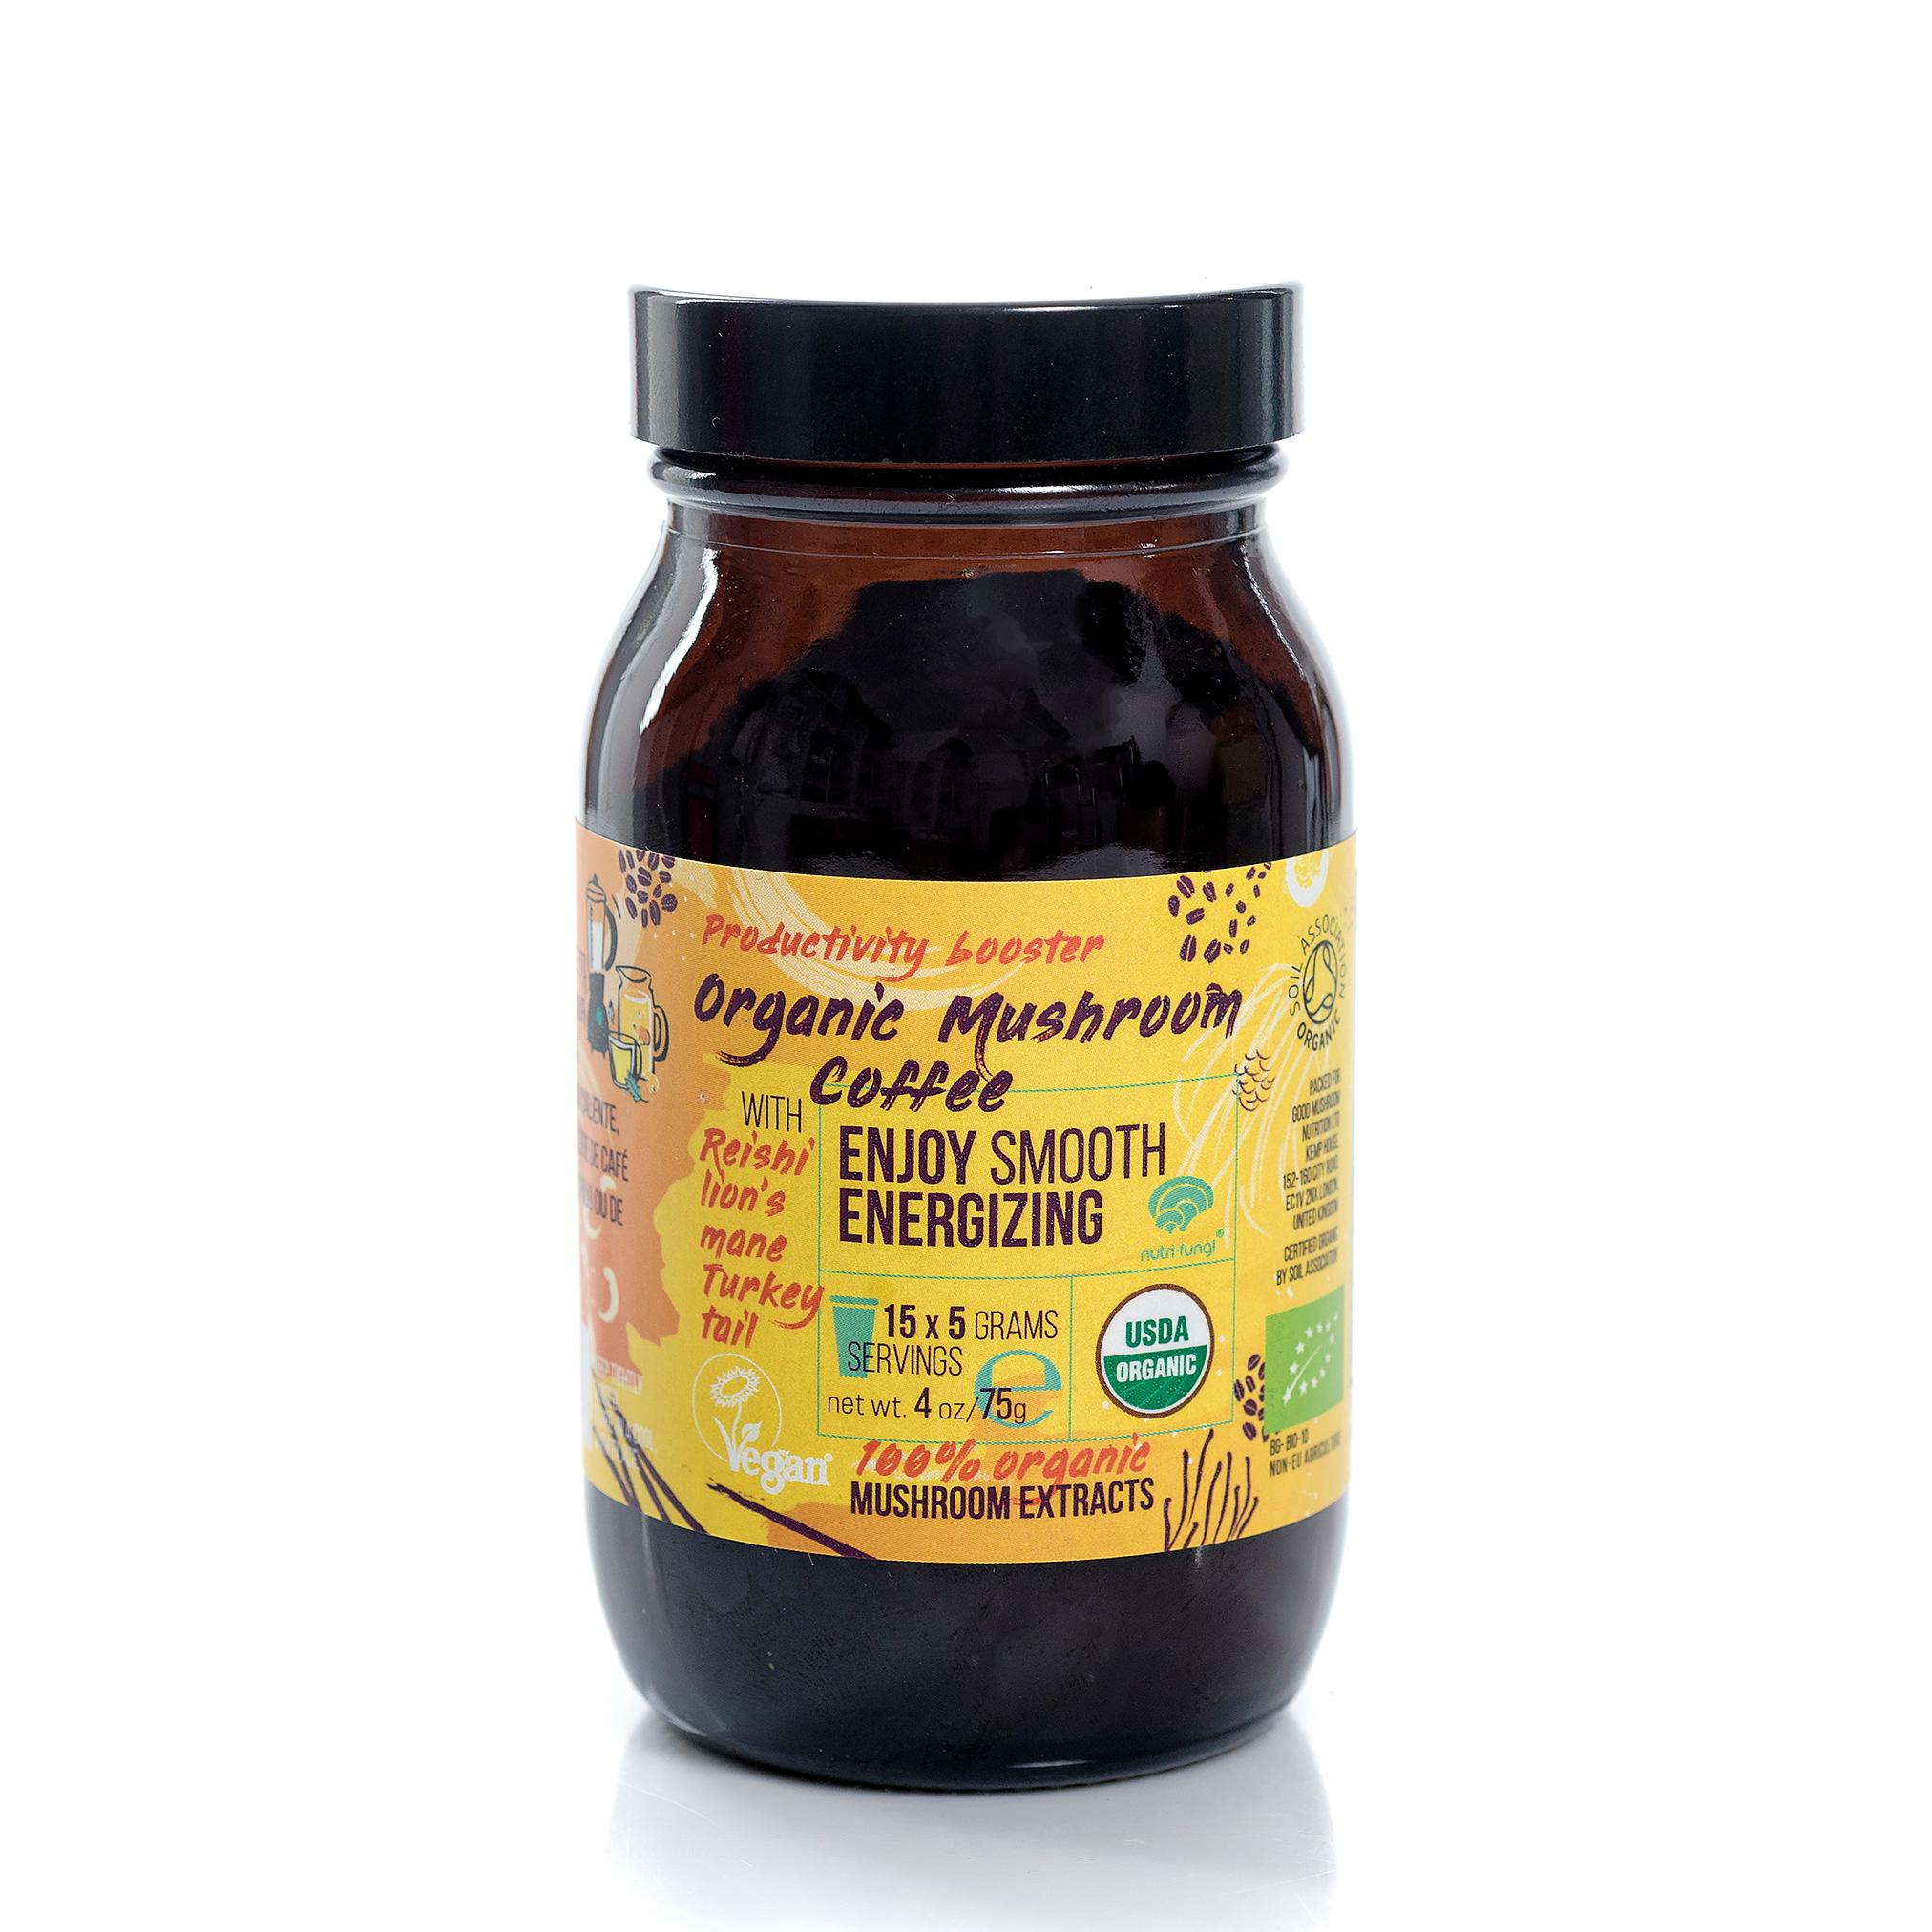 Organic Mushroom Coffee, Enjoy Smooth Energizing 75g